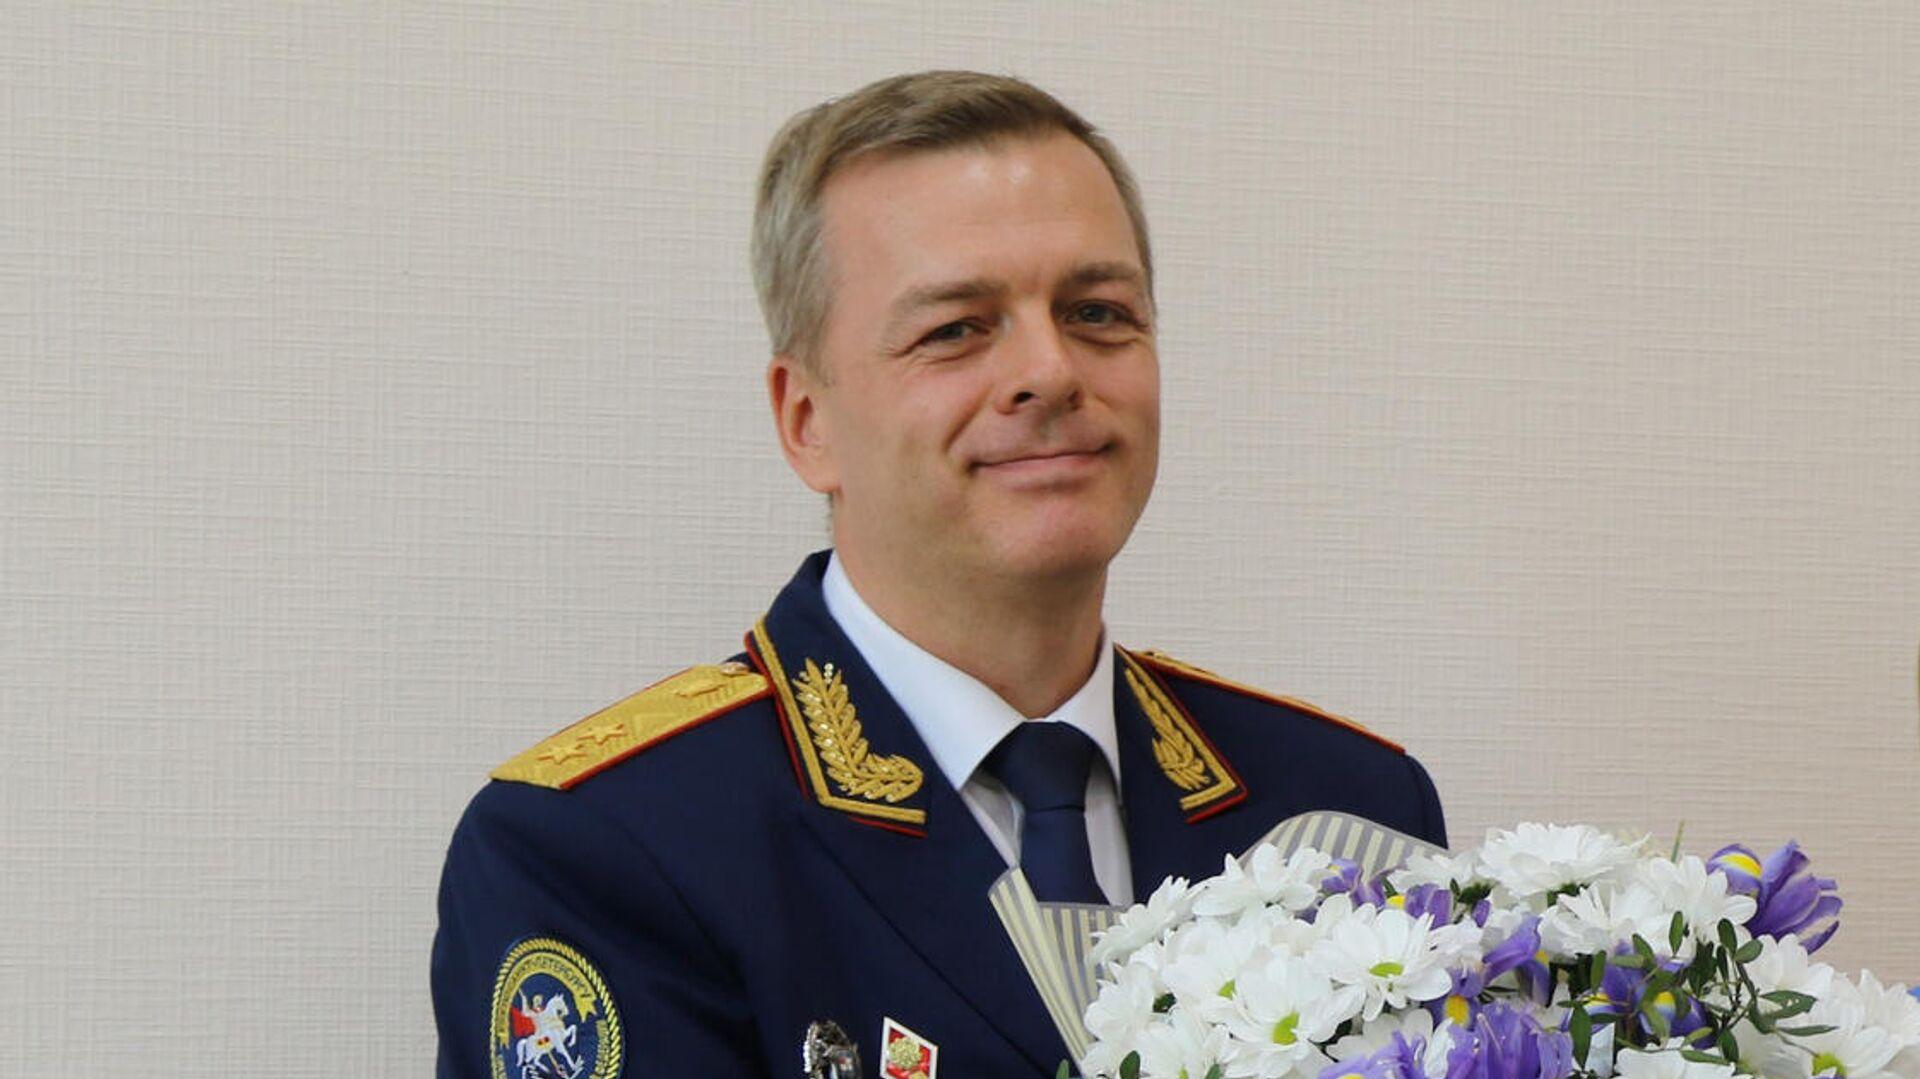 Клаус Александр Владимирович - РИА Новости, 1920, 03.03.2021